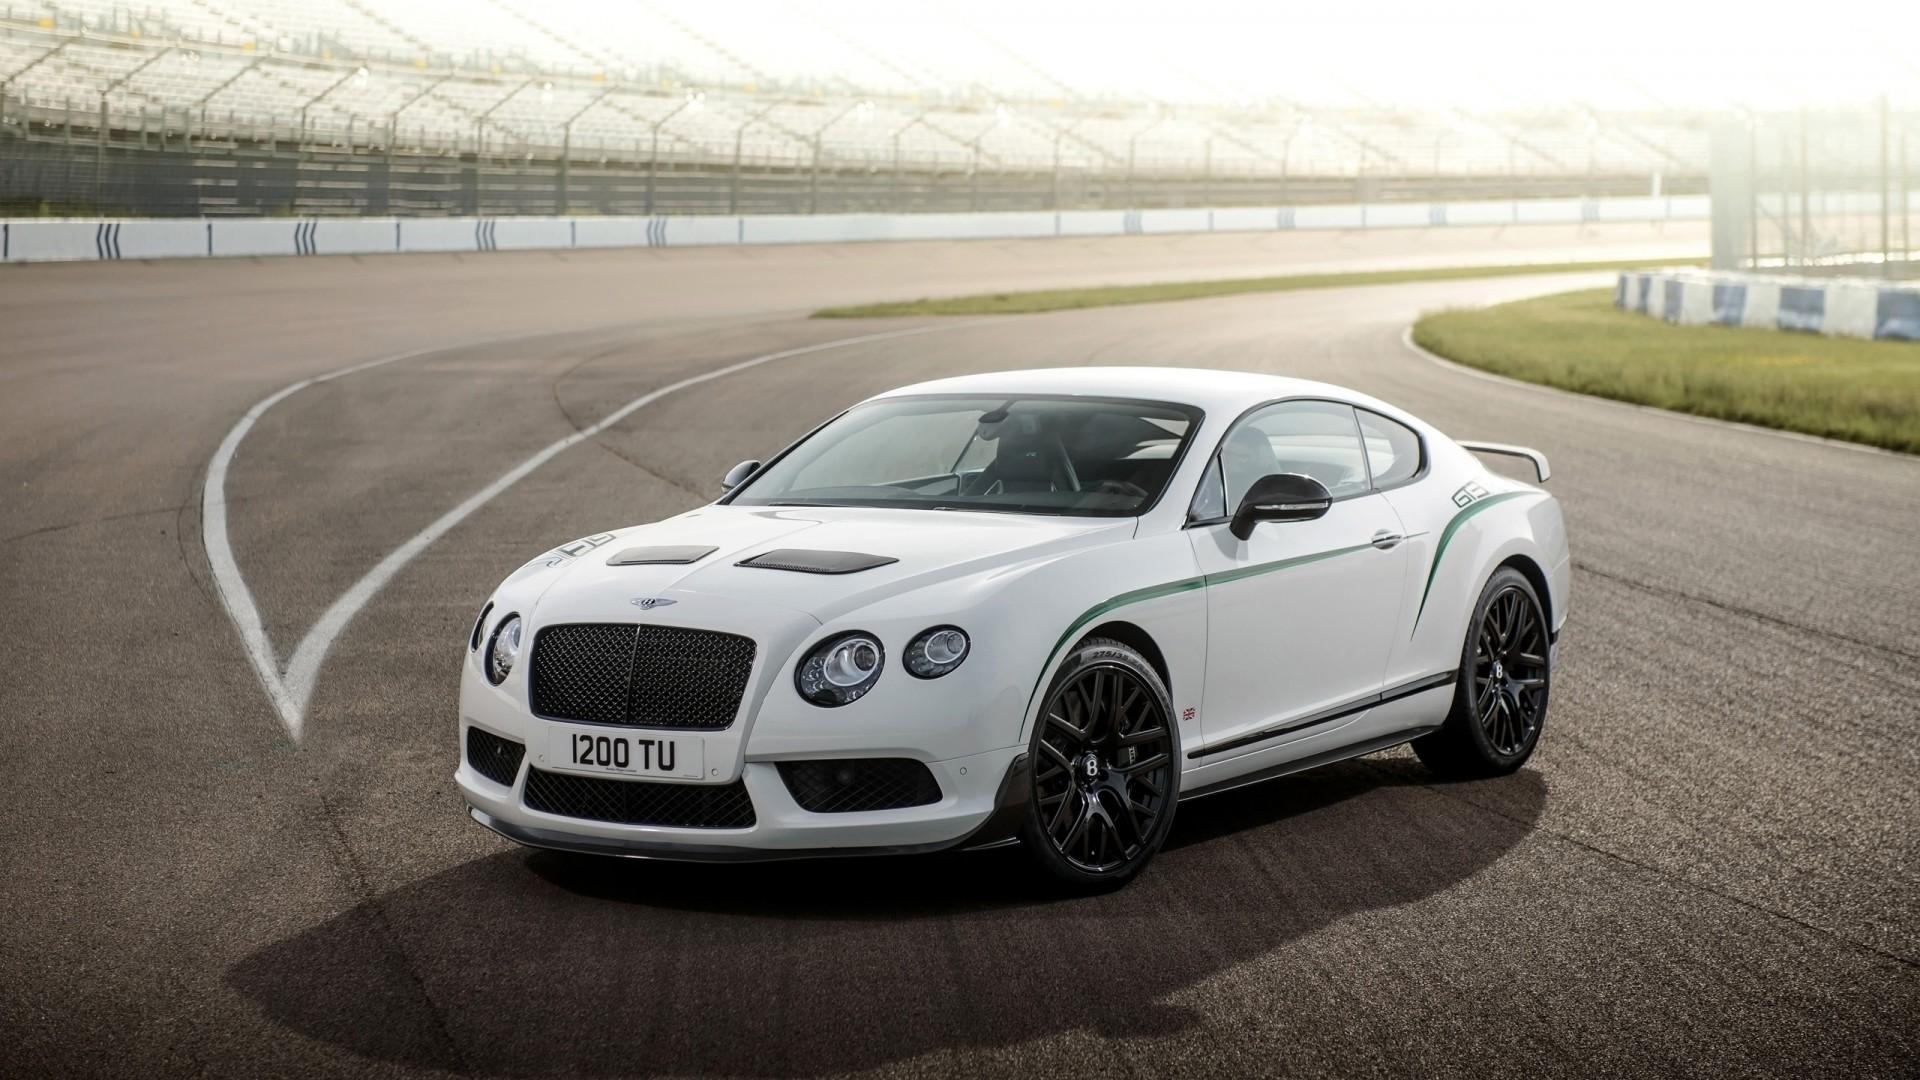 2015 Bentley Continental GT3 R Wallpaper  HD Car Wallpapers